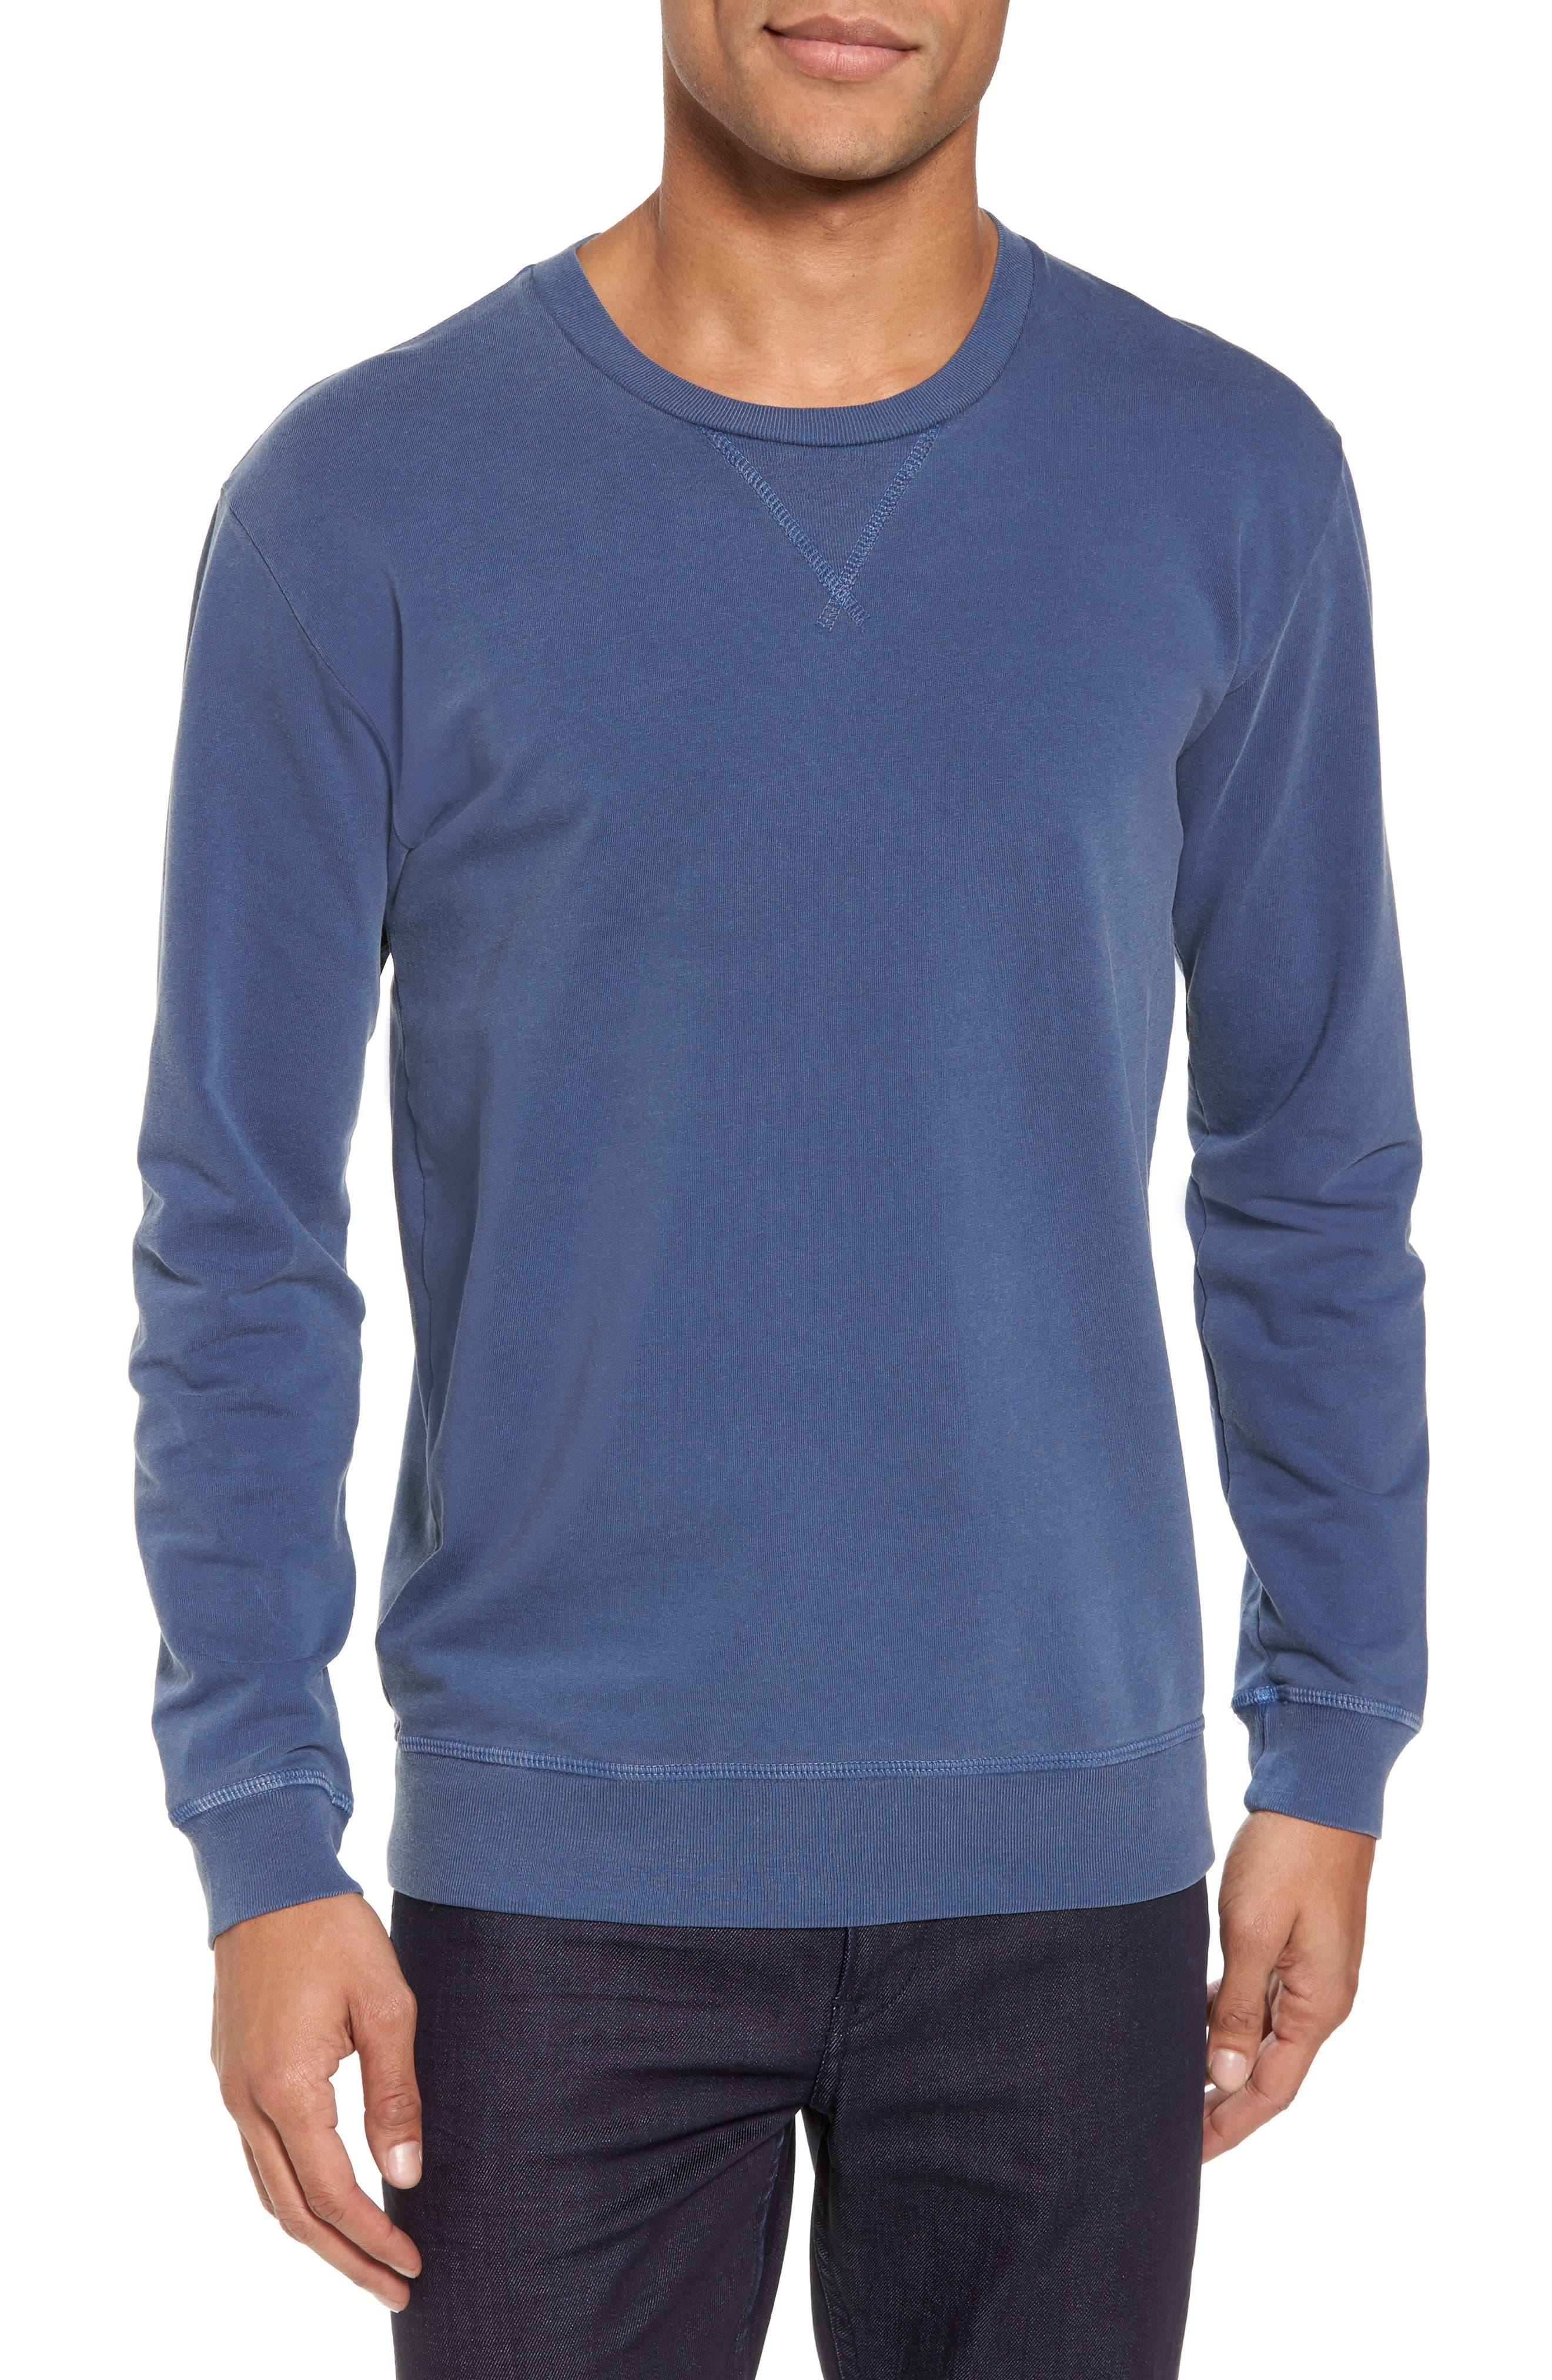 GOODLIFE, Slim Fit Crewneck Sweatshirt, Main thumbnail 1, color, FADED NAVY